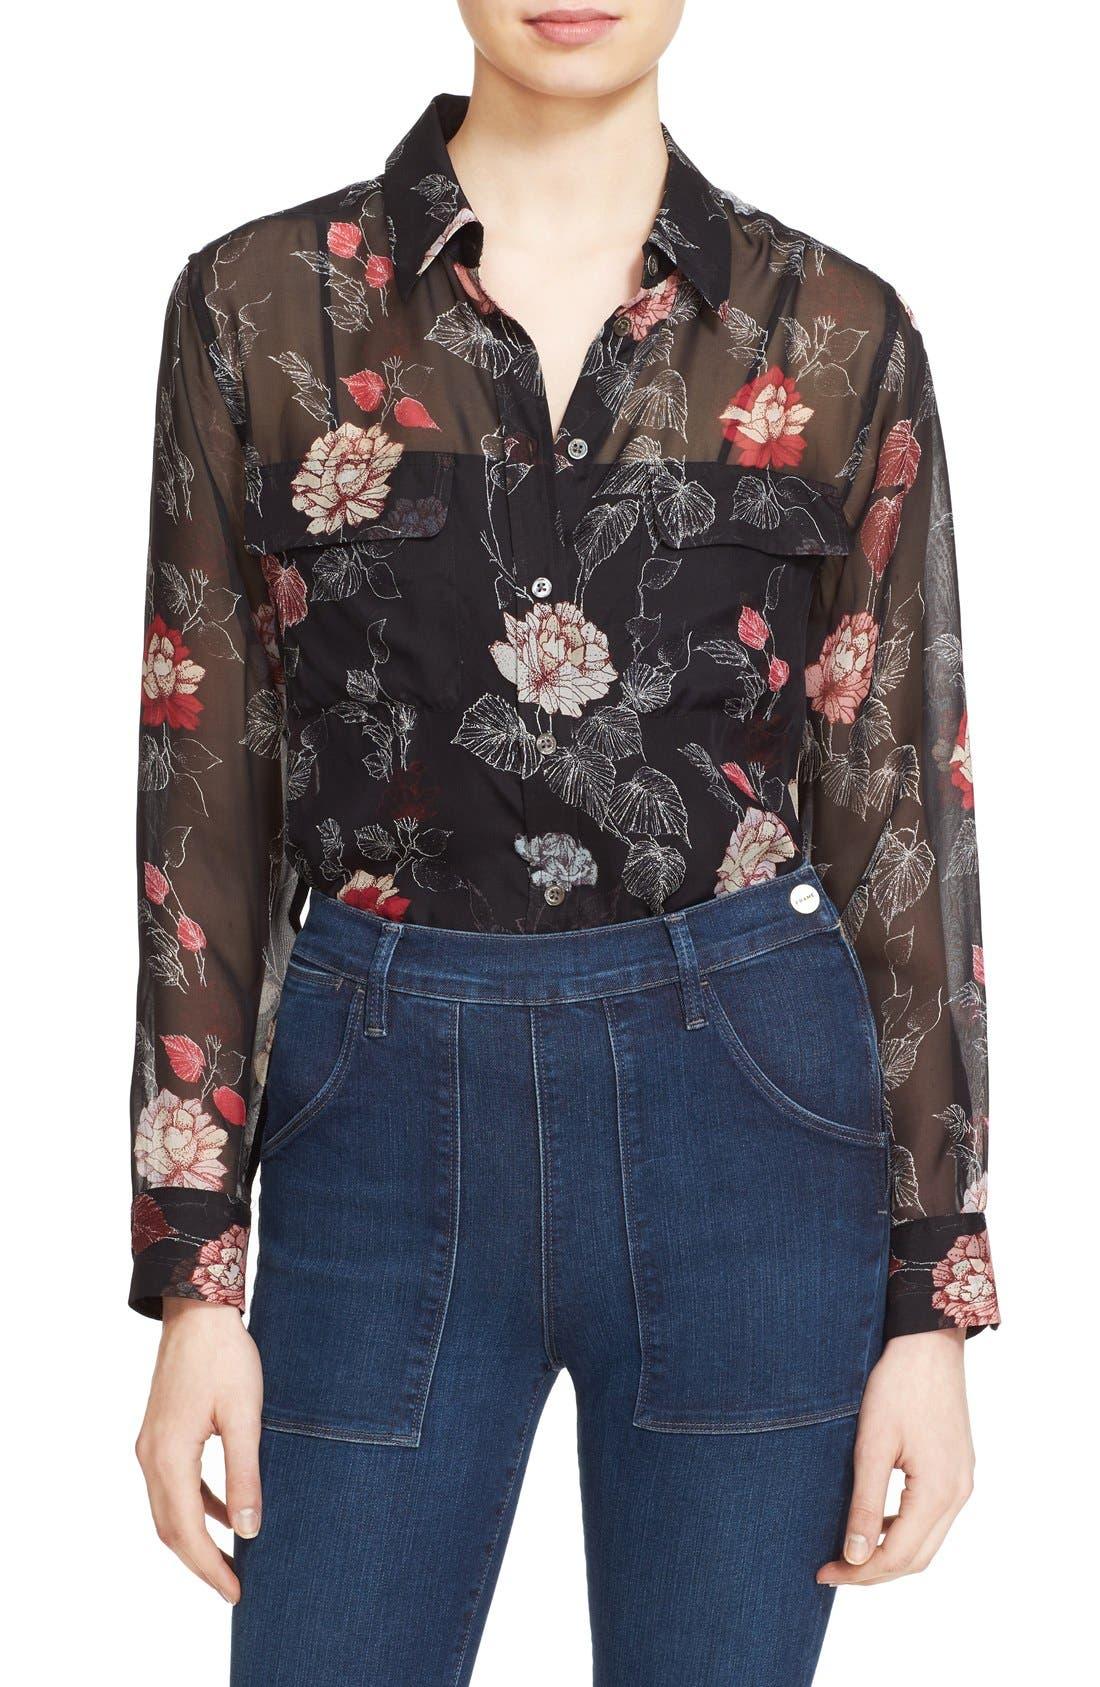 Main Image - Equipment 'Signature' Floral Print Silk Shirt